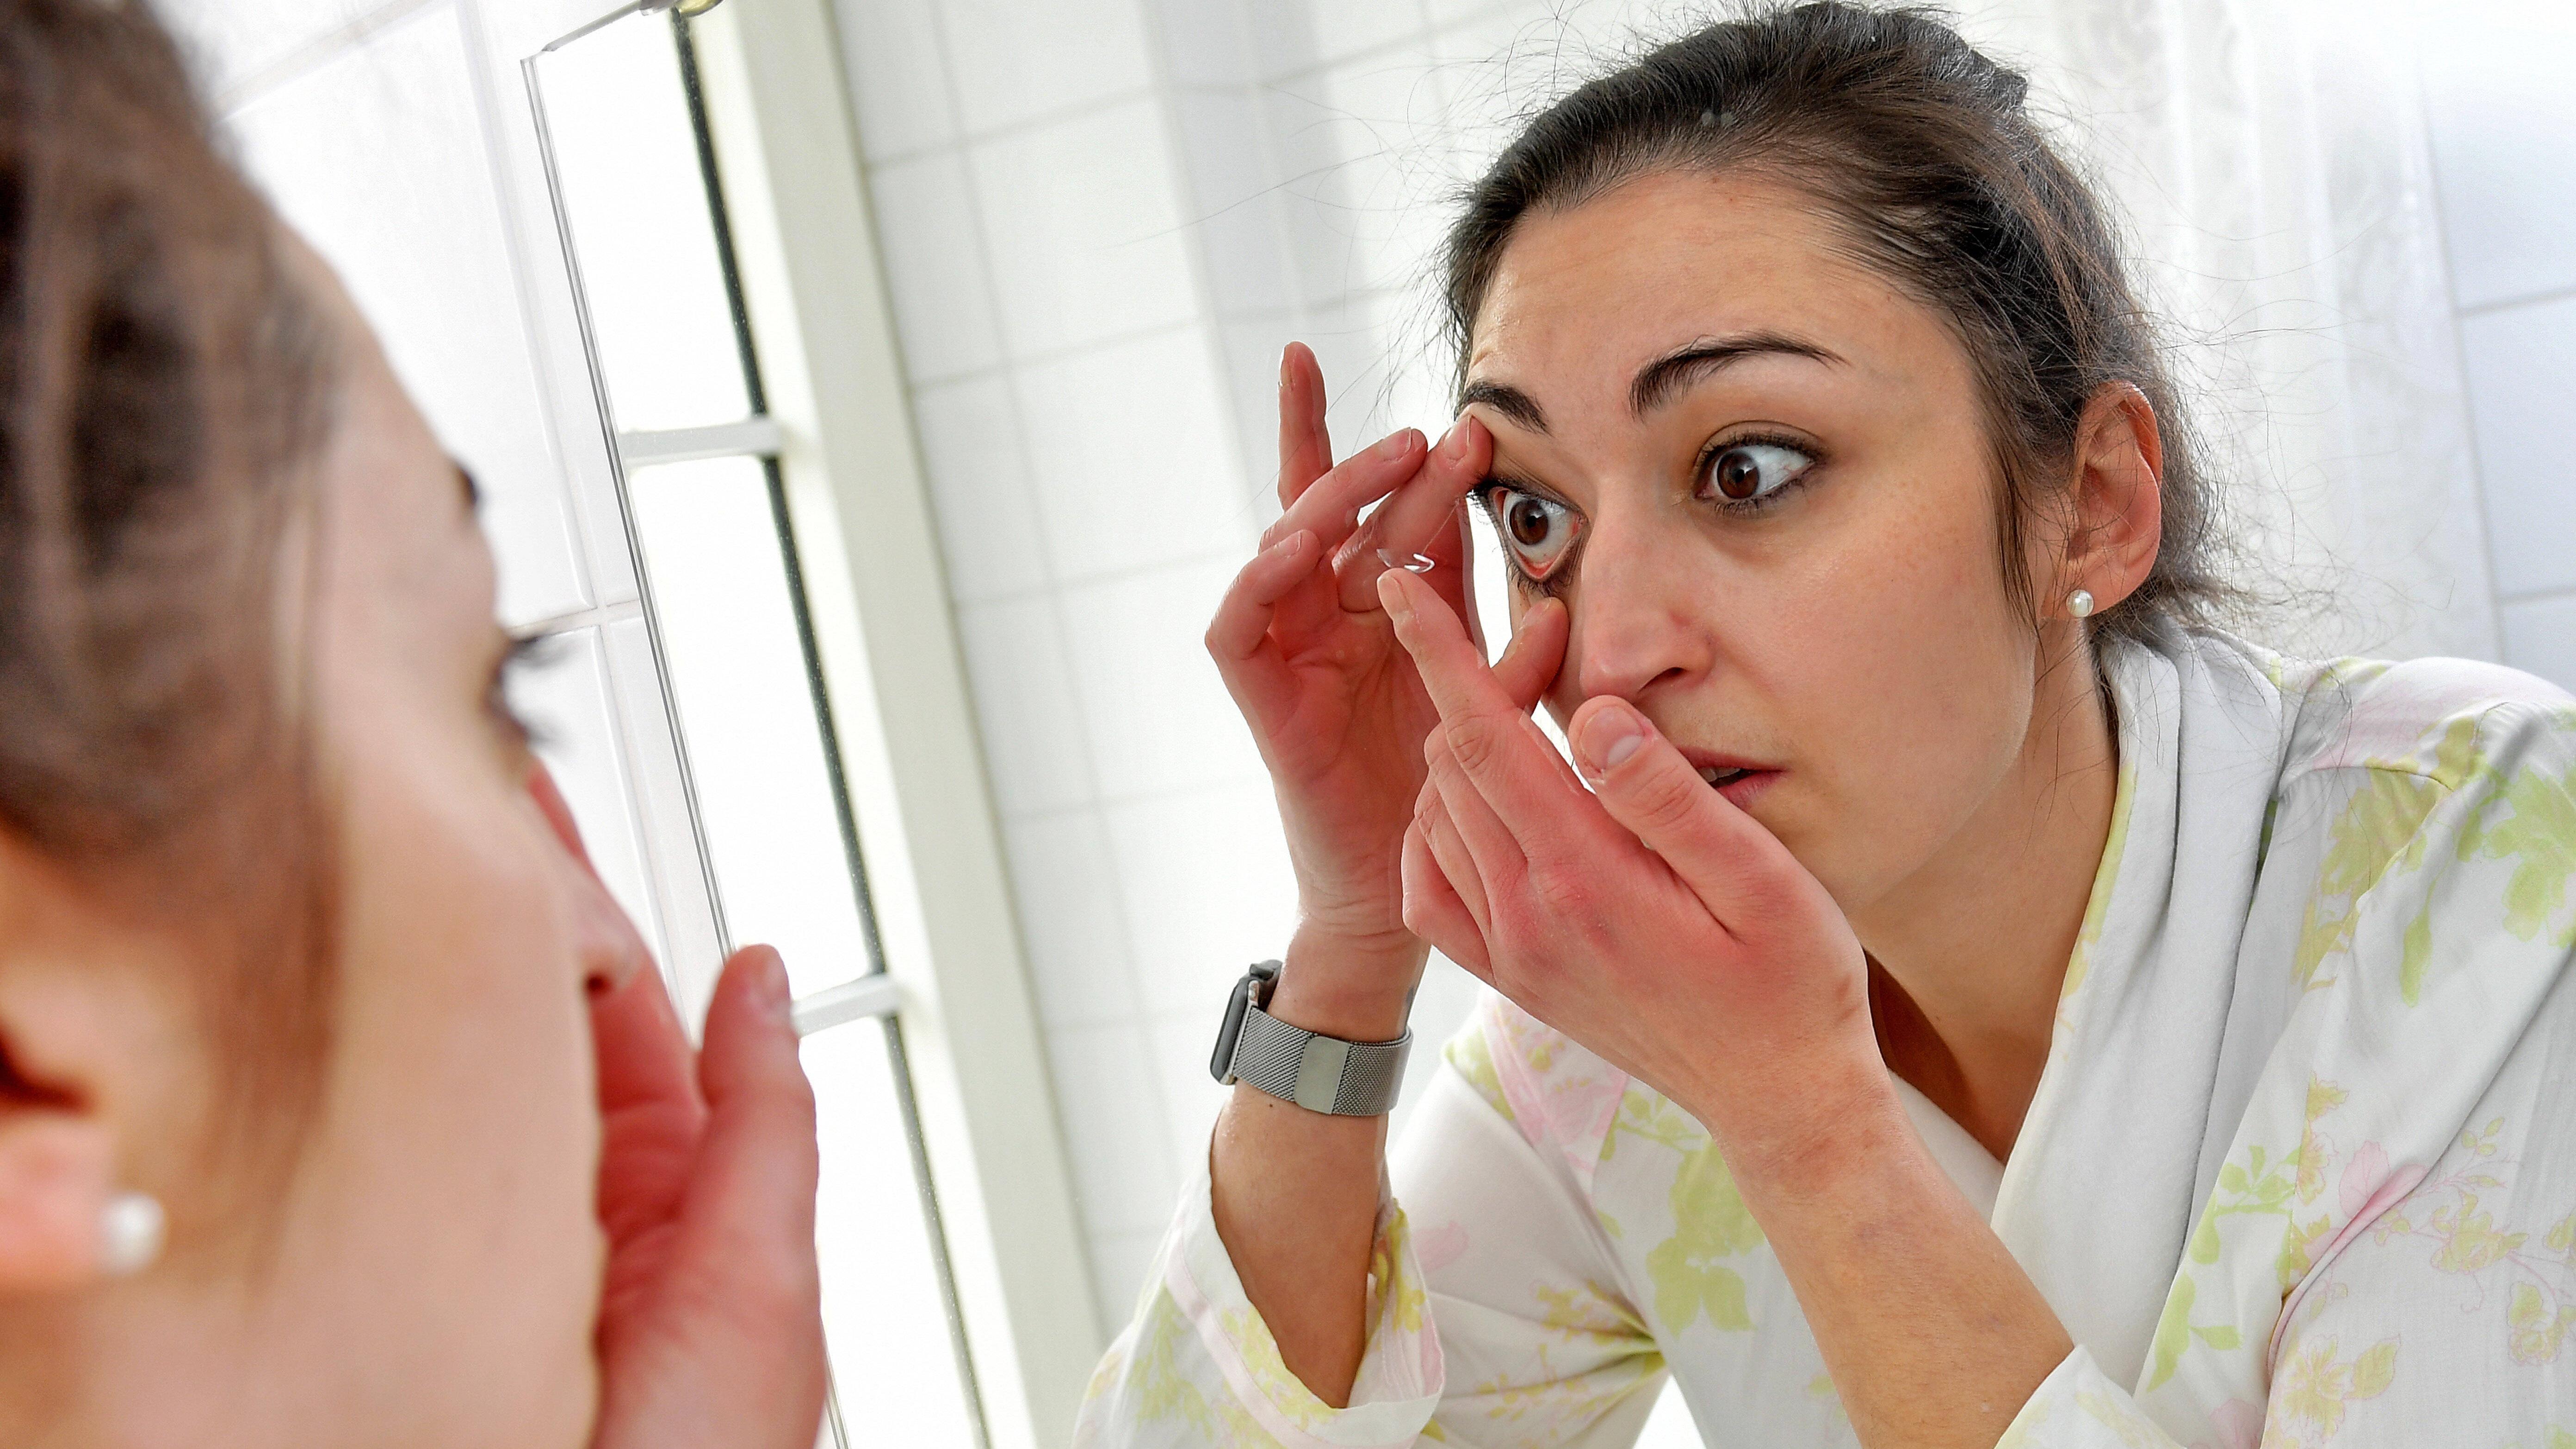 Kontaktlinse rausnehmen